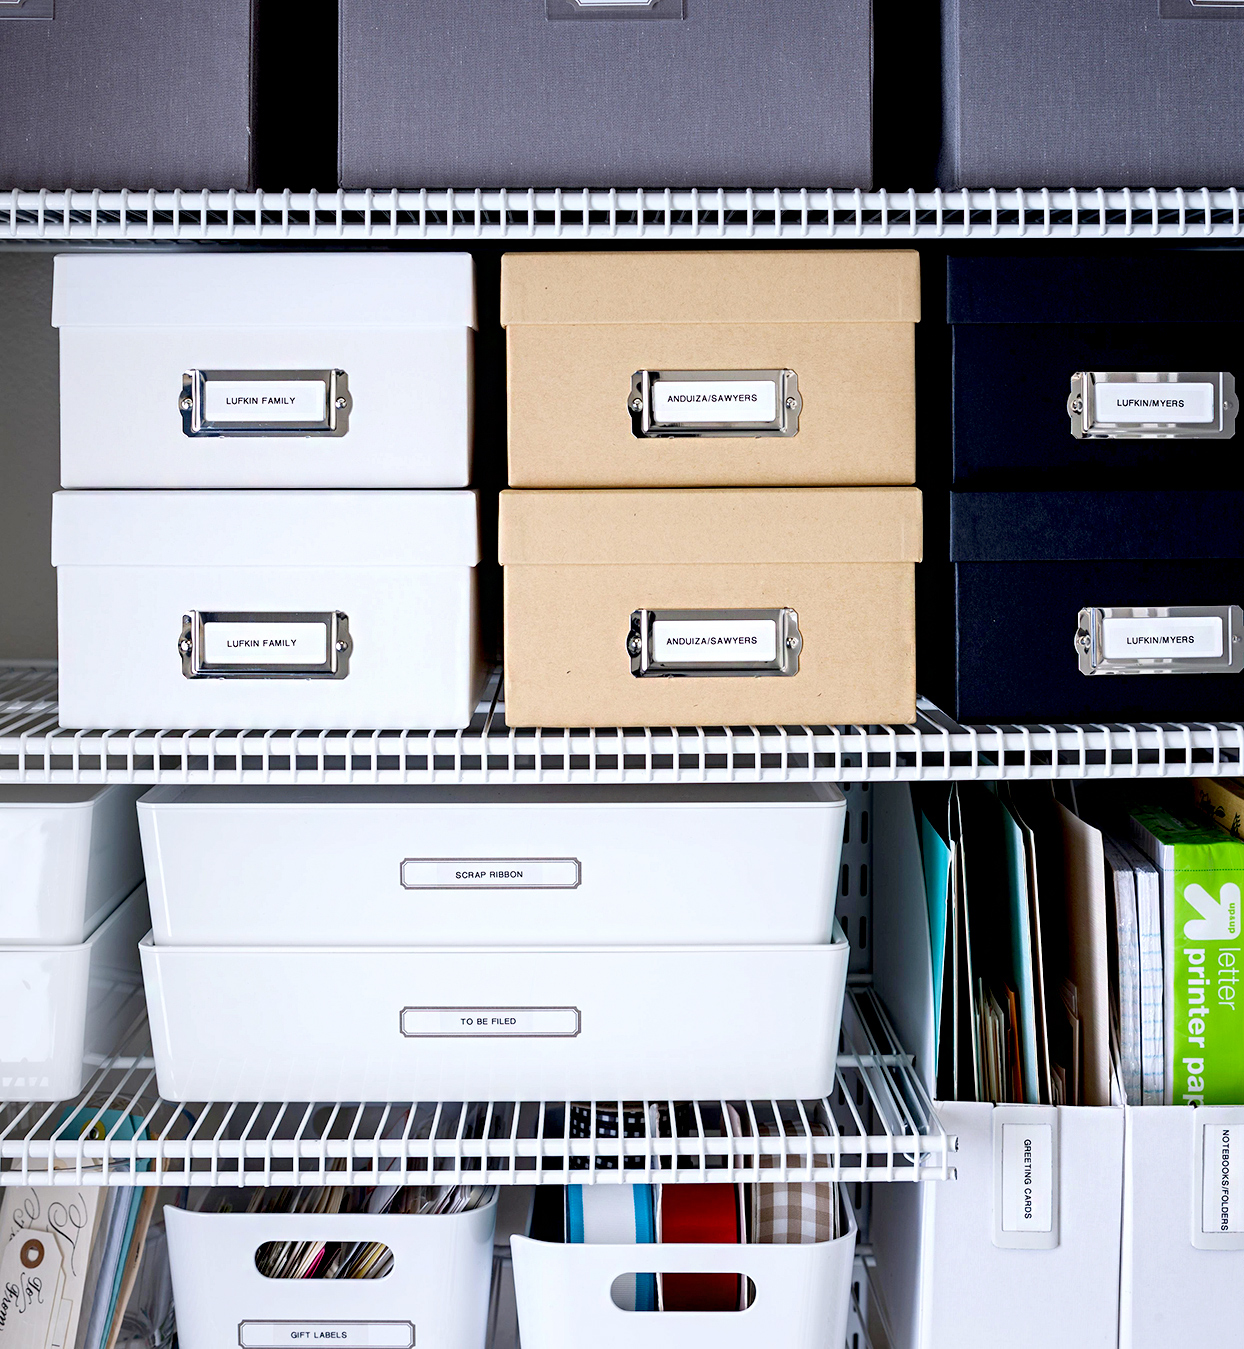 Set up a filing system